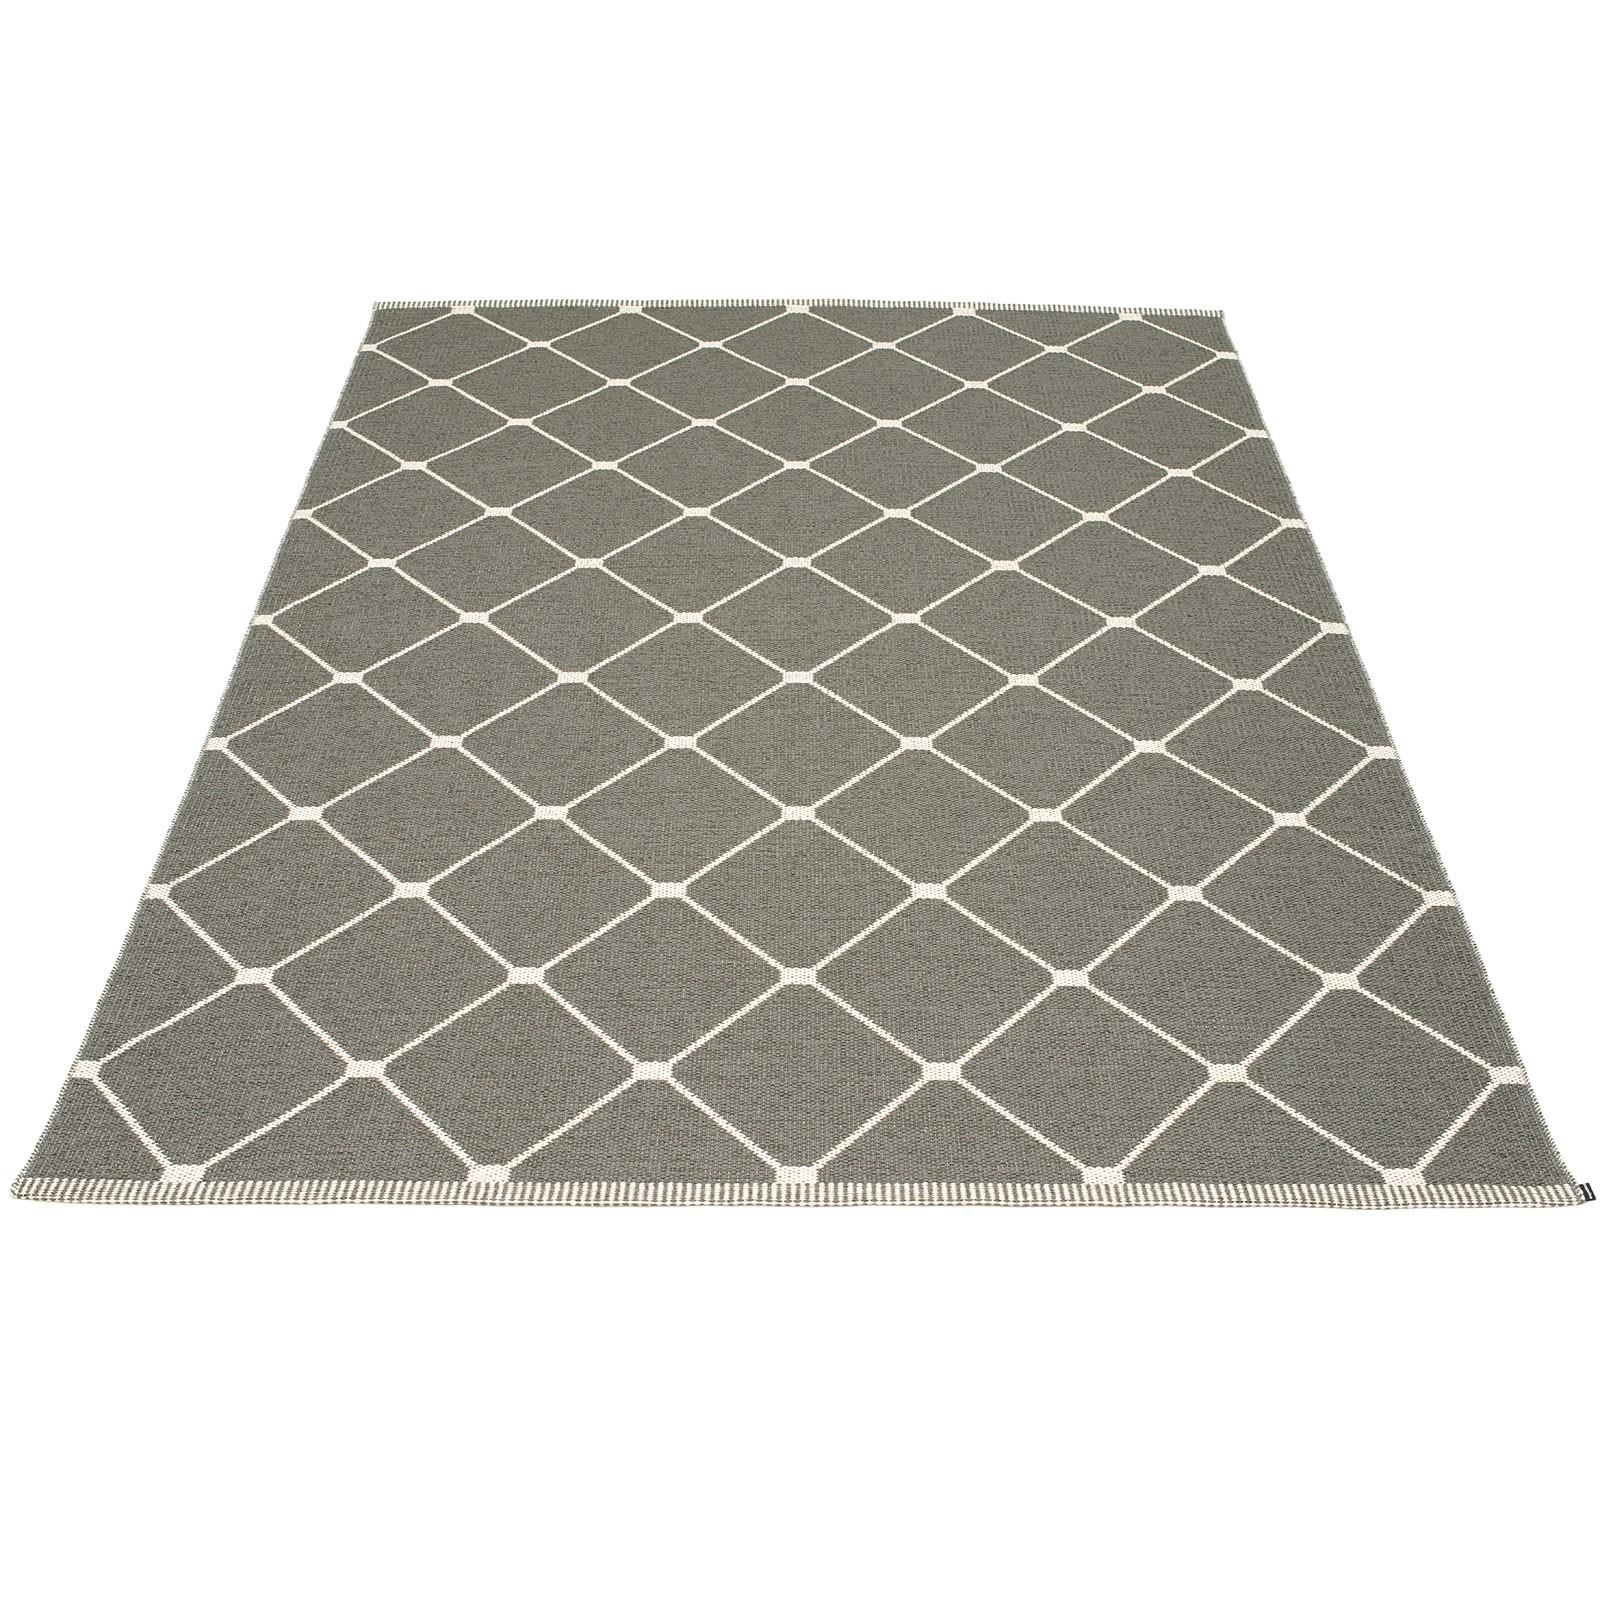 teppich charcoal 180 x 275 cm pappelina regina. Black Bedroom Furniture Sets. Home Design Ideas